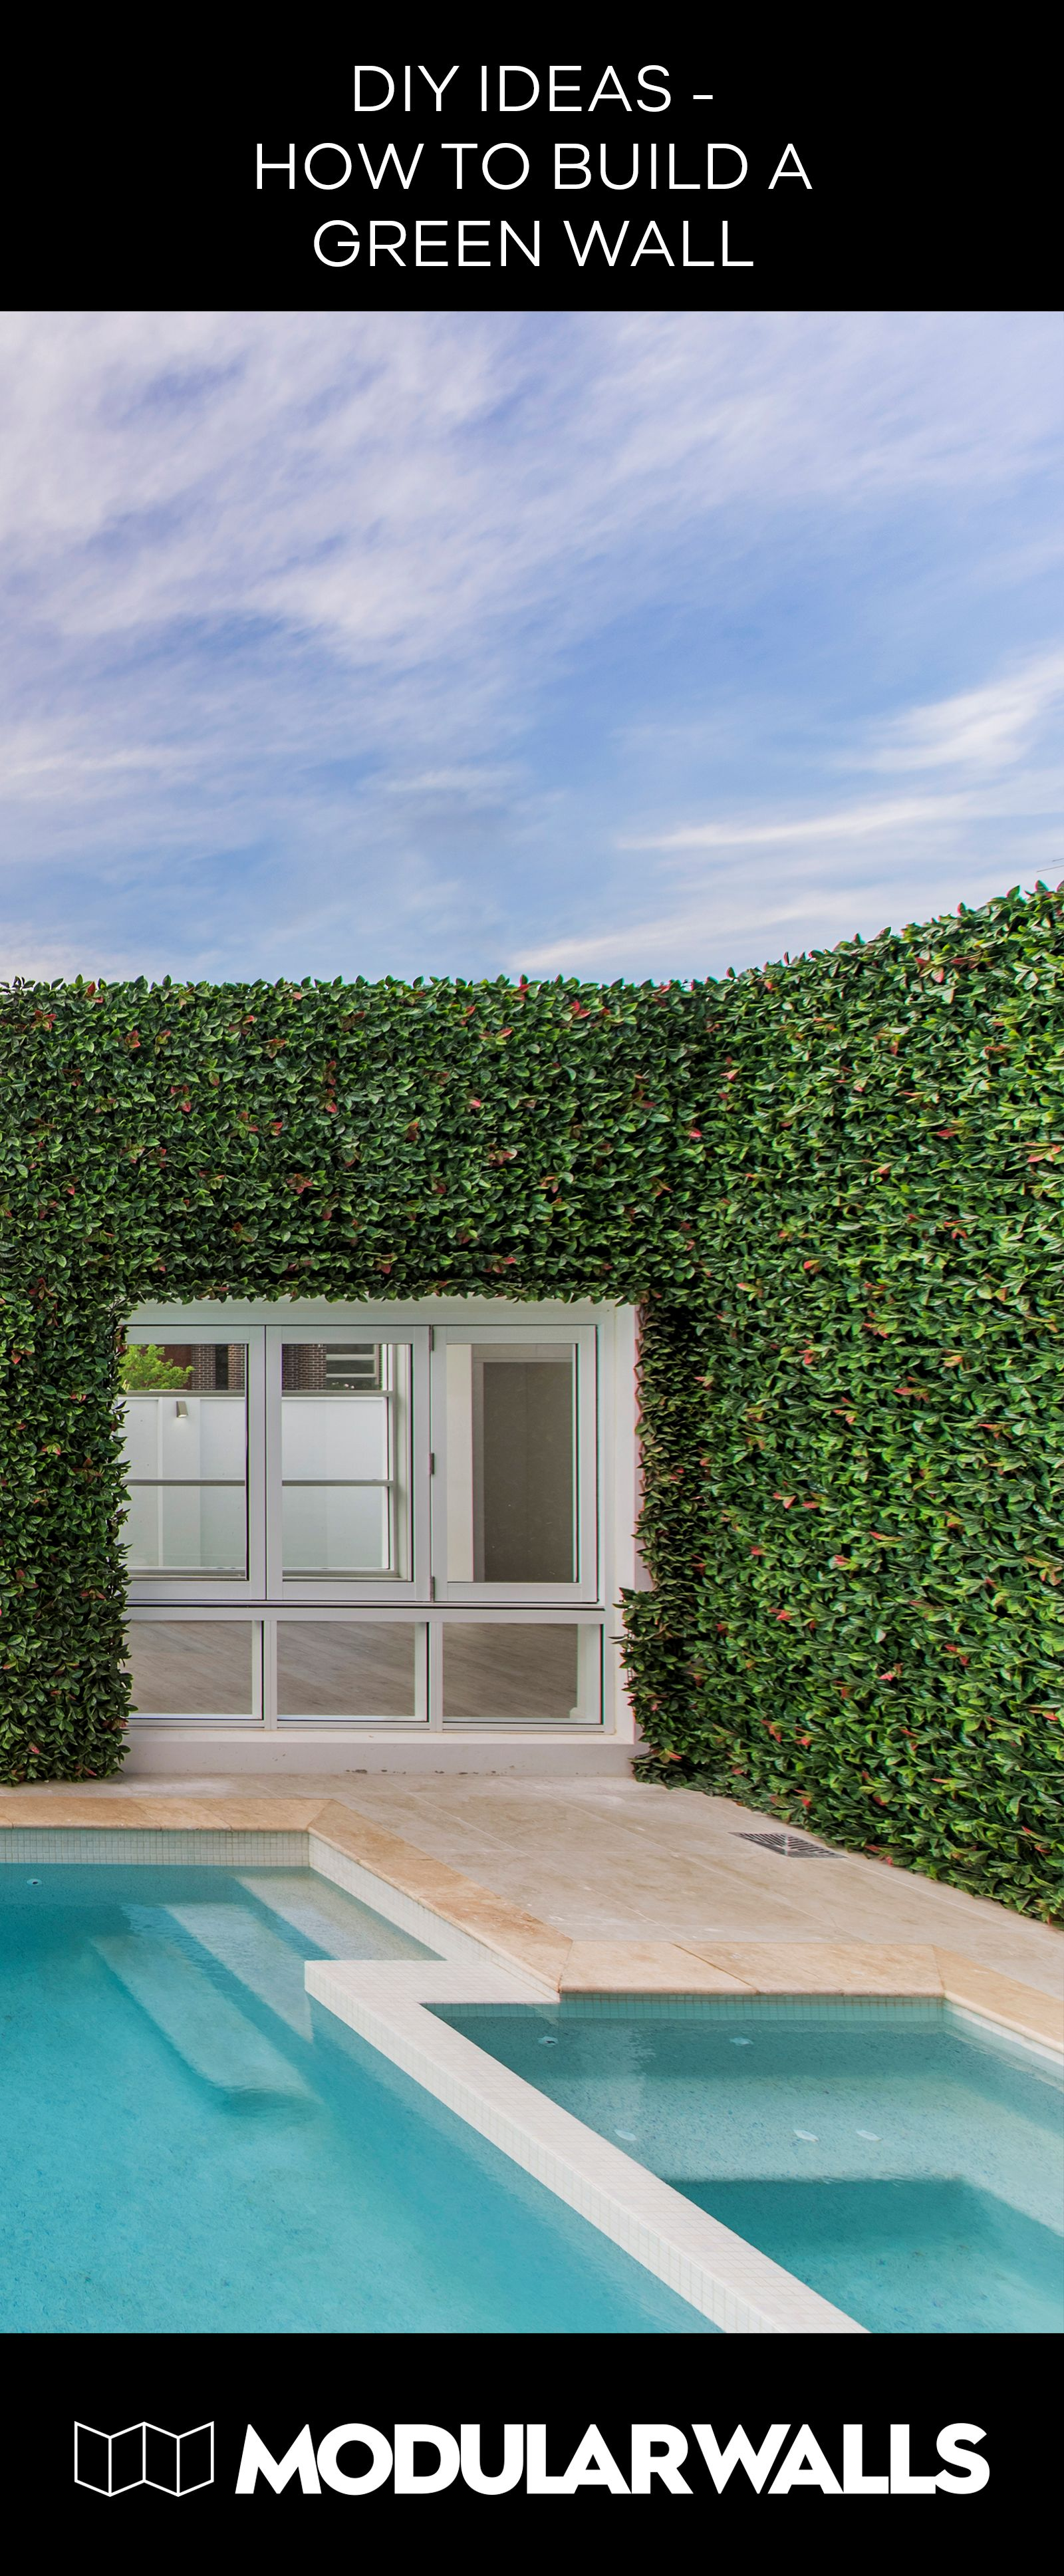 Diy ideas how to build a green wall modularwalls